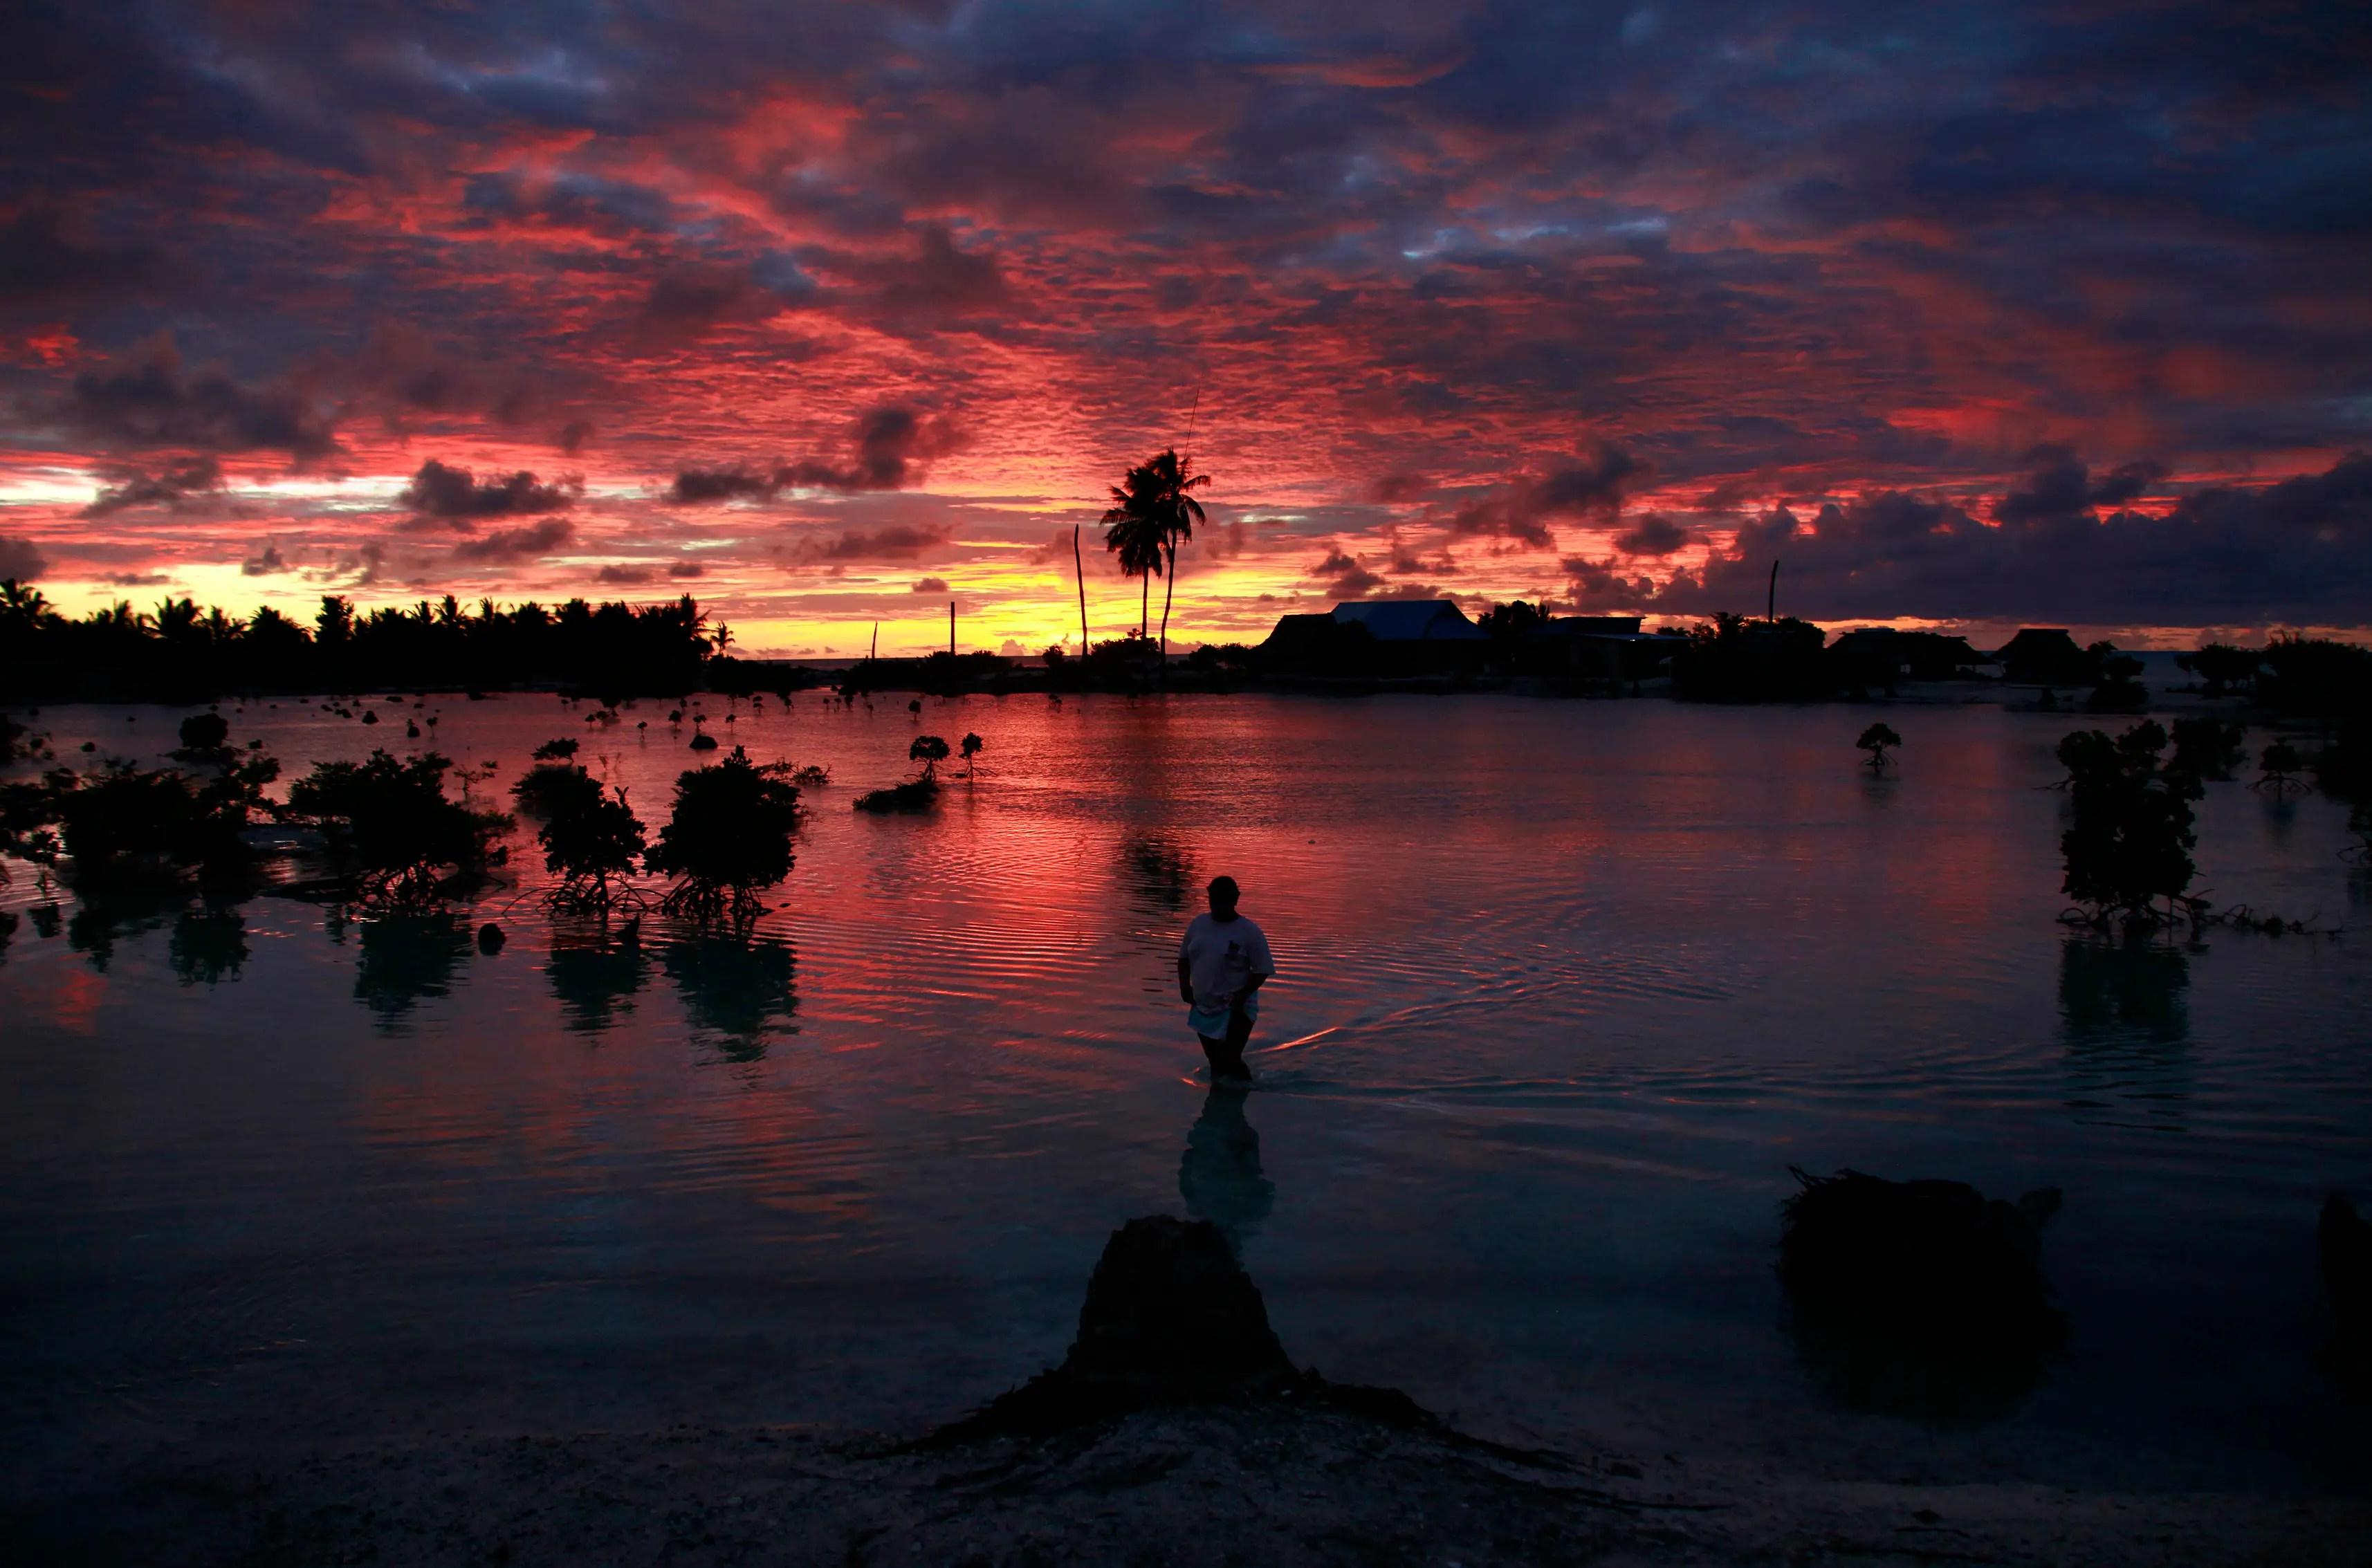 The entire island nation of Kiribati is vanishing because of global warming. On average, land in Kiribati is only six feet above sea level.